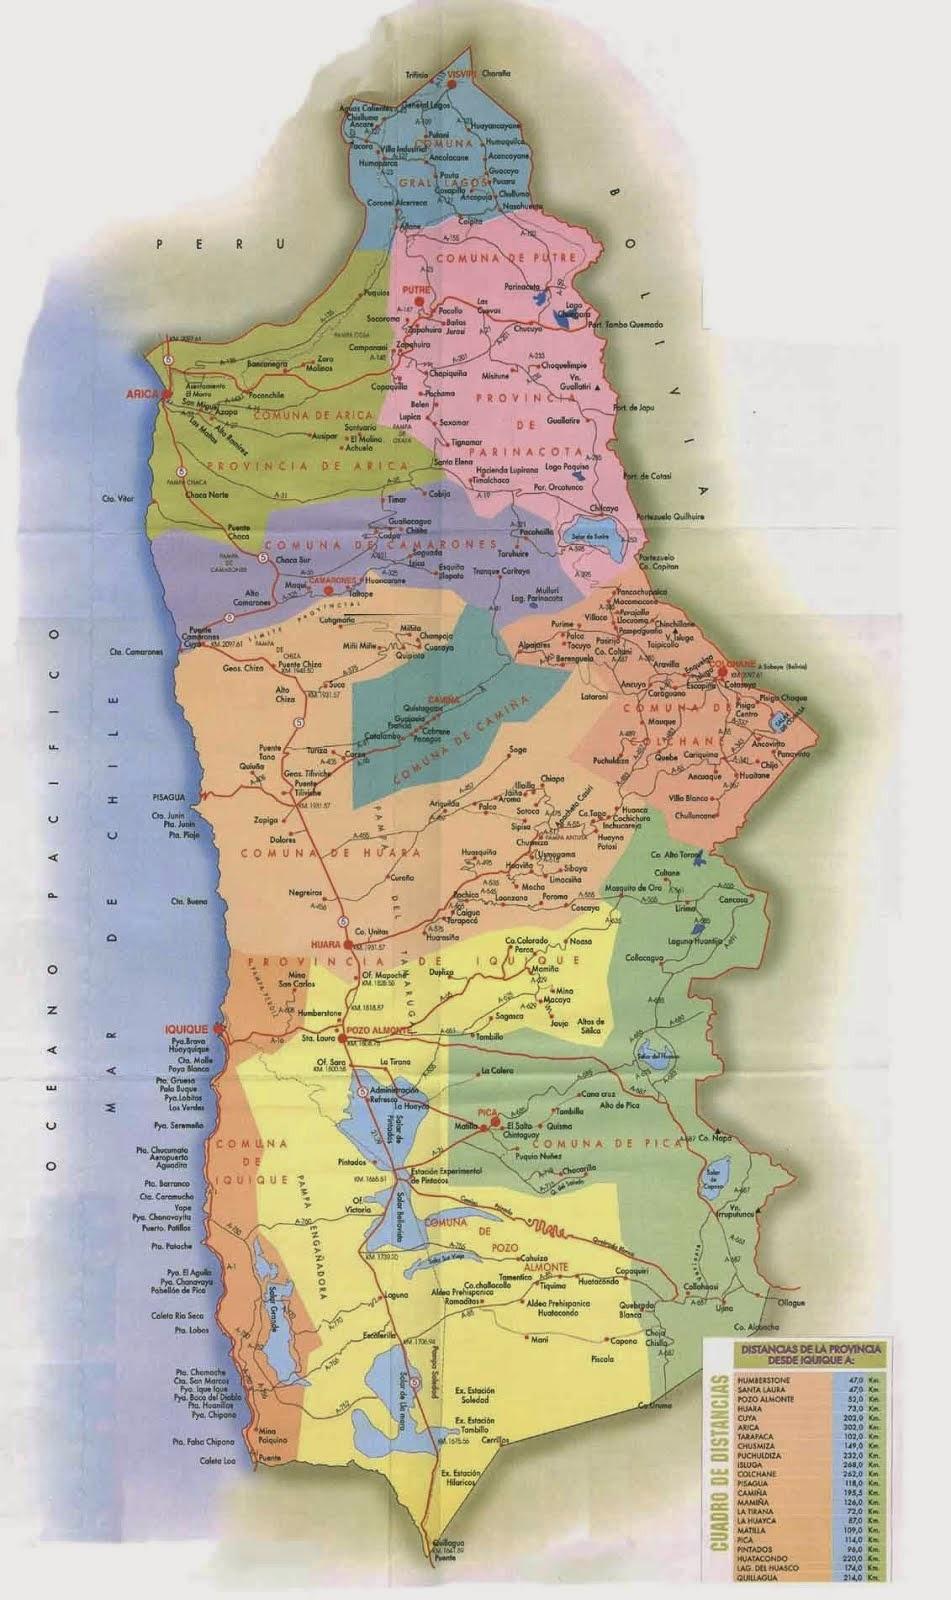 Territorio Peruano Ocupado